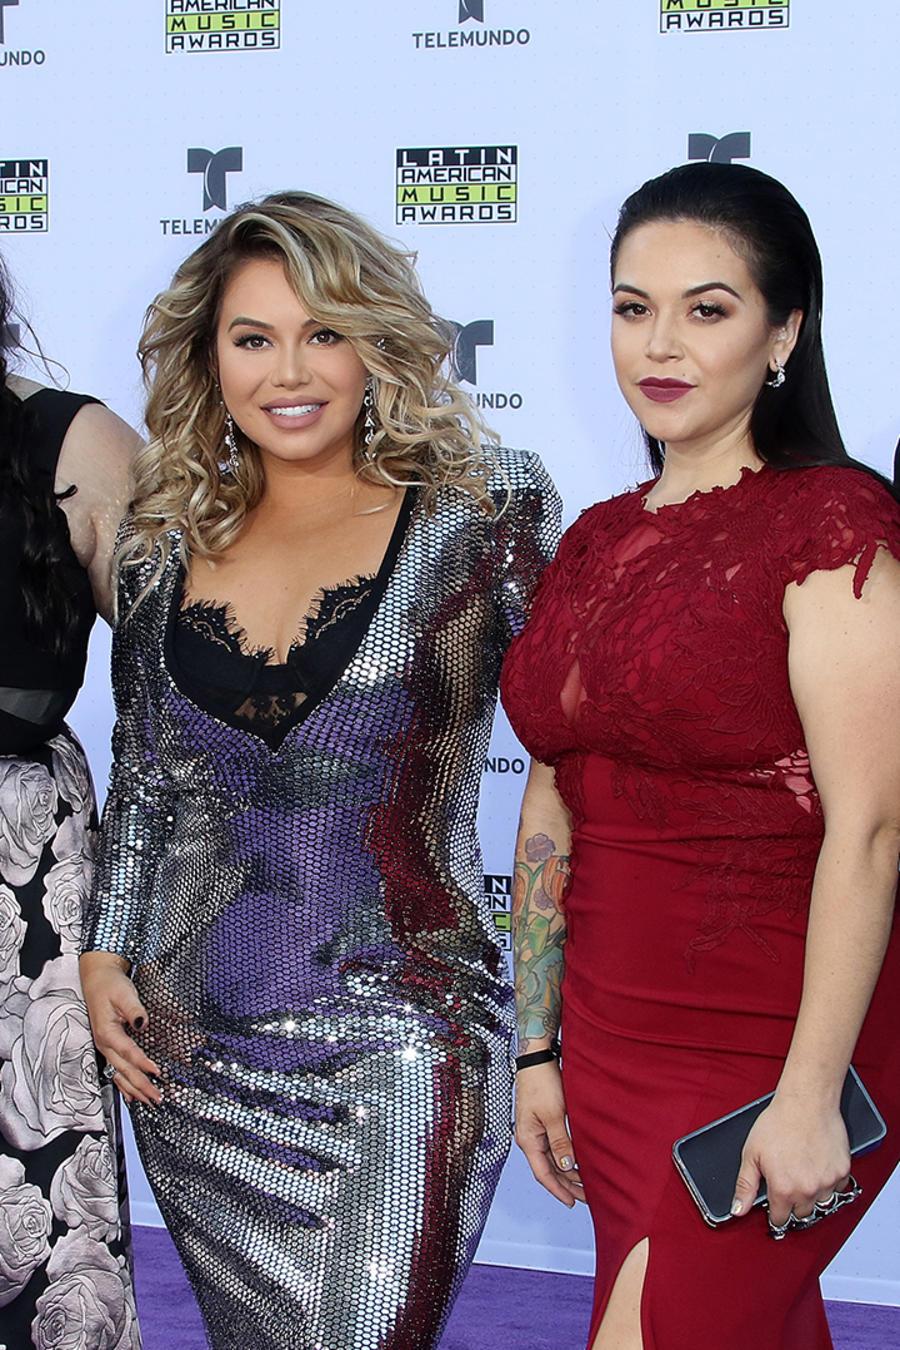 2017 Latin American Music Awards - Arrivals